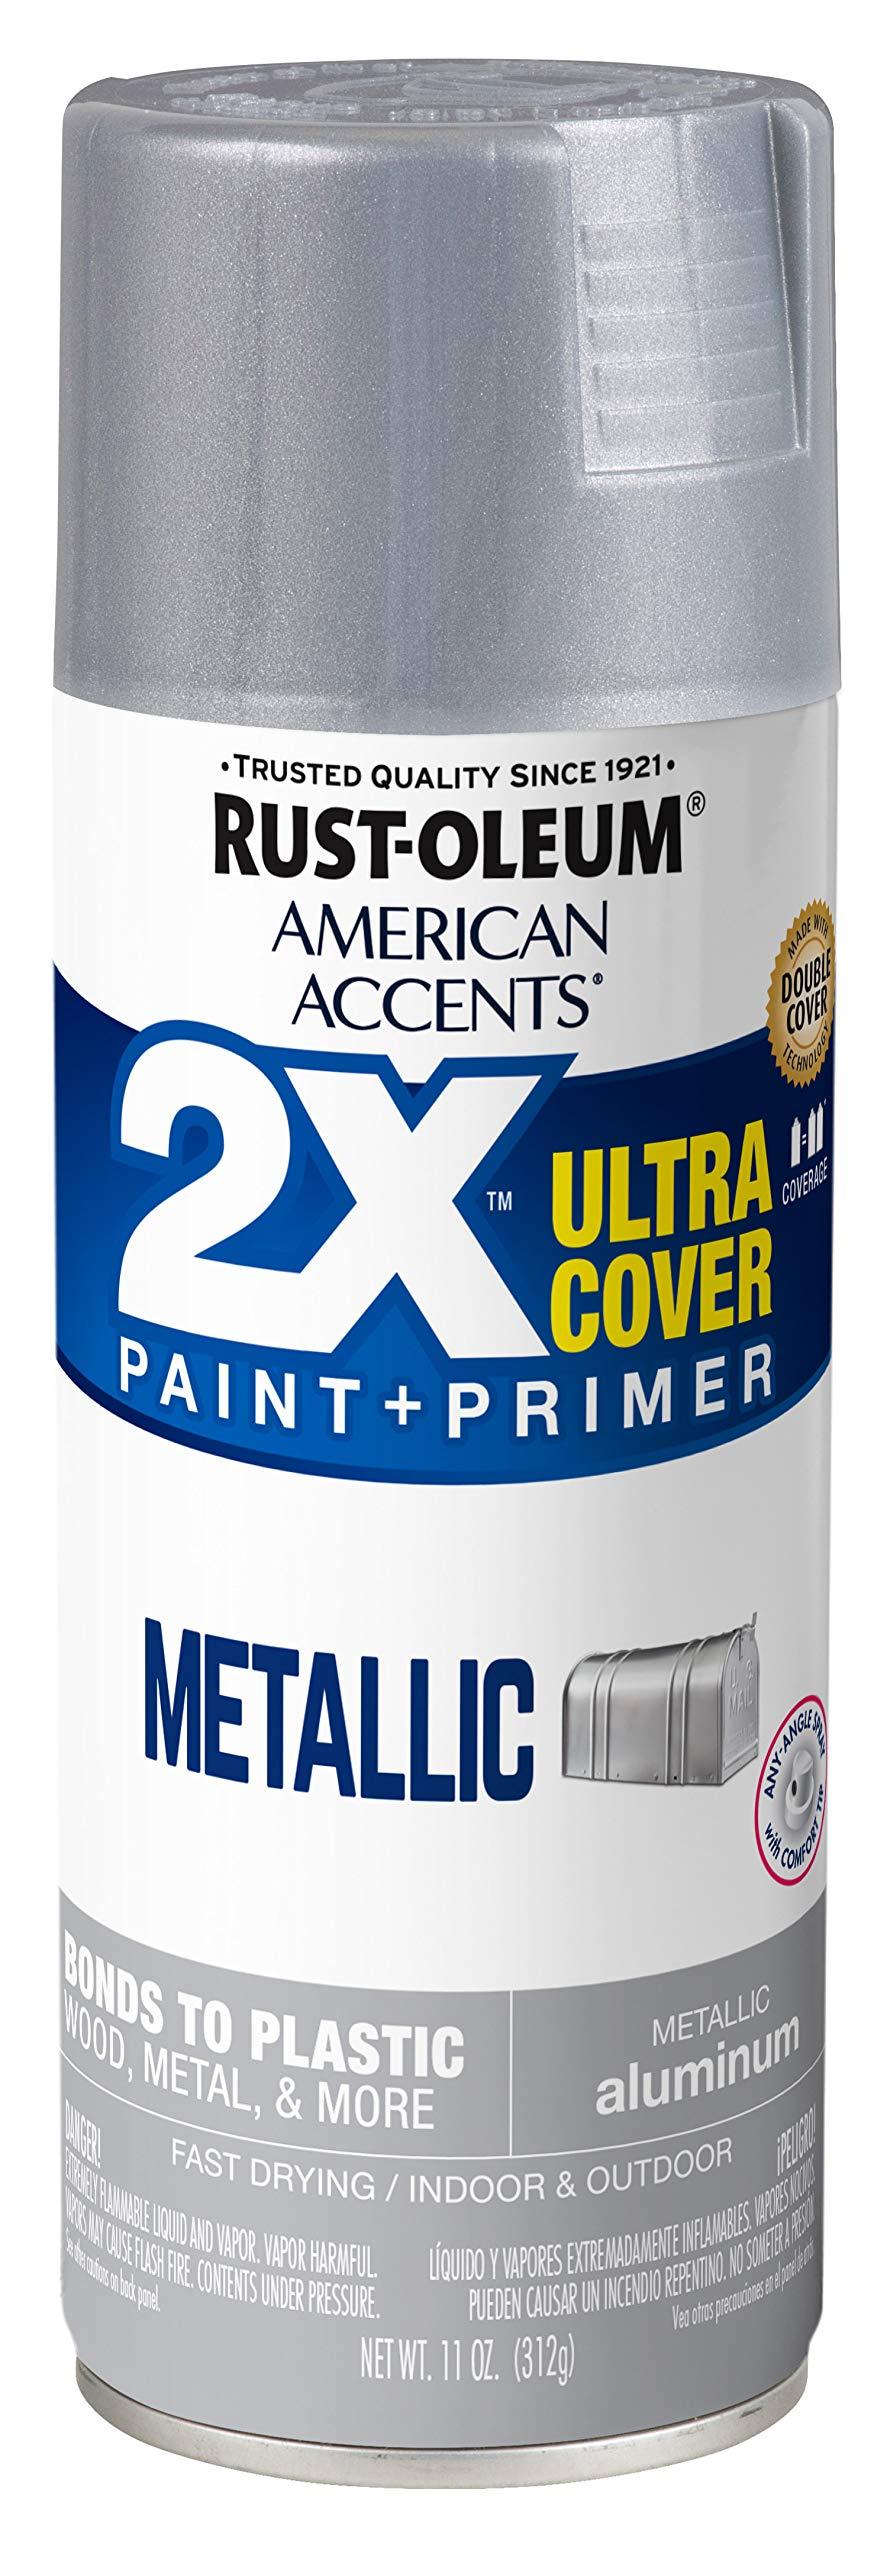 Rust-Oleum 327907 American Accents Spray Paint, 1 Pack, Metallic